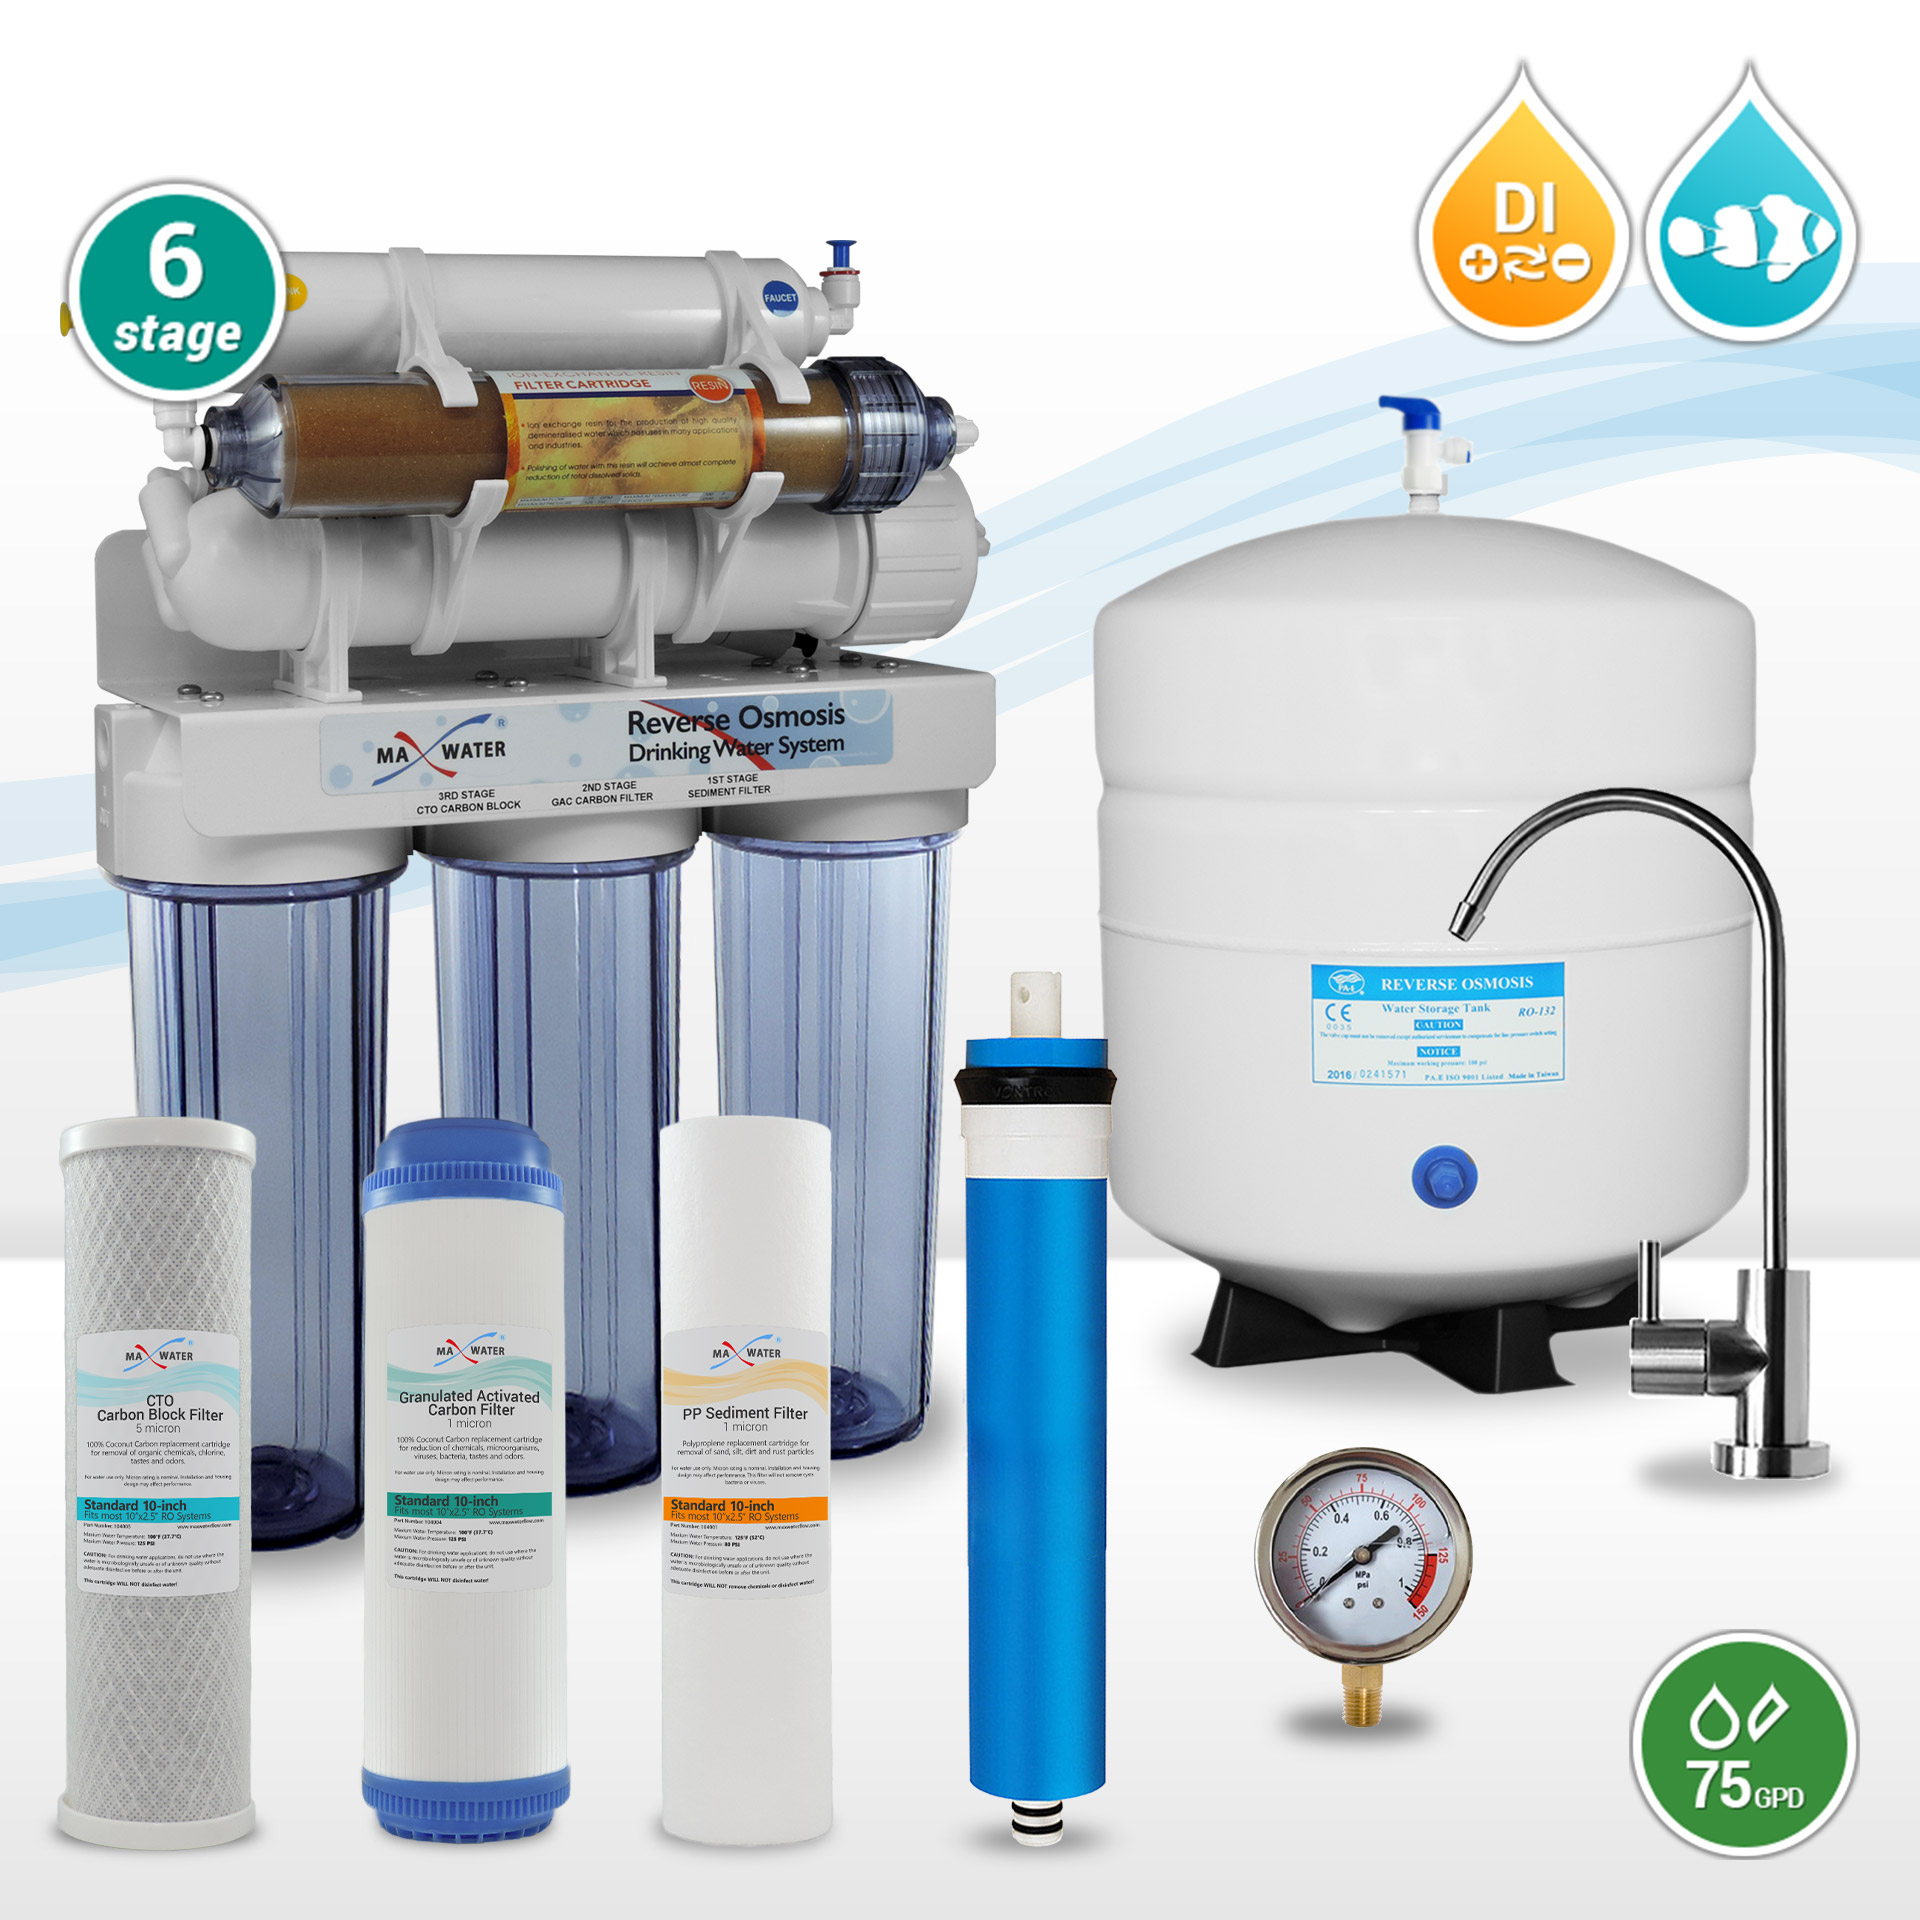 6 stage 75 GPD Dual Reef Aquarium & Drinking Reverse Osmosis Water